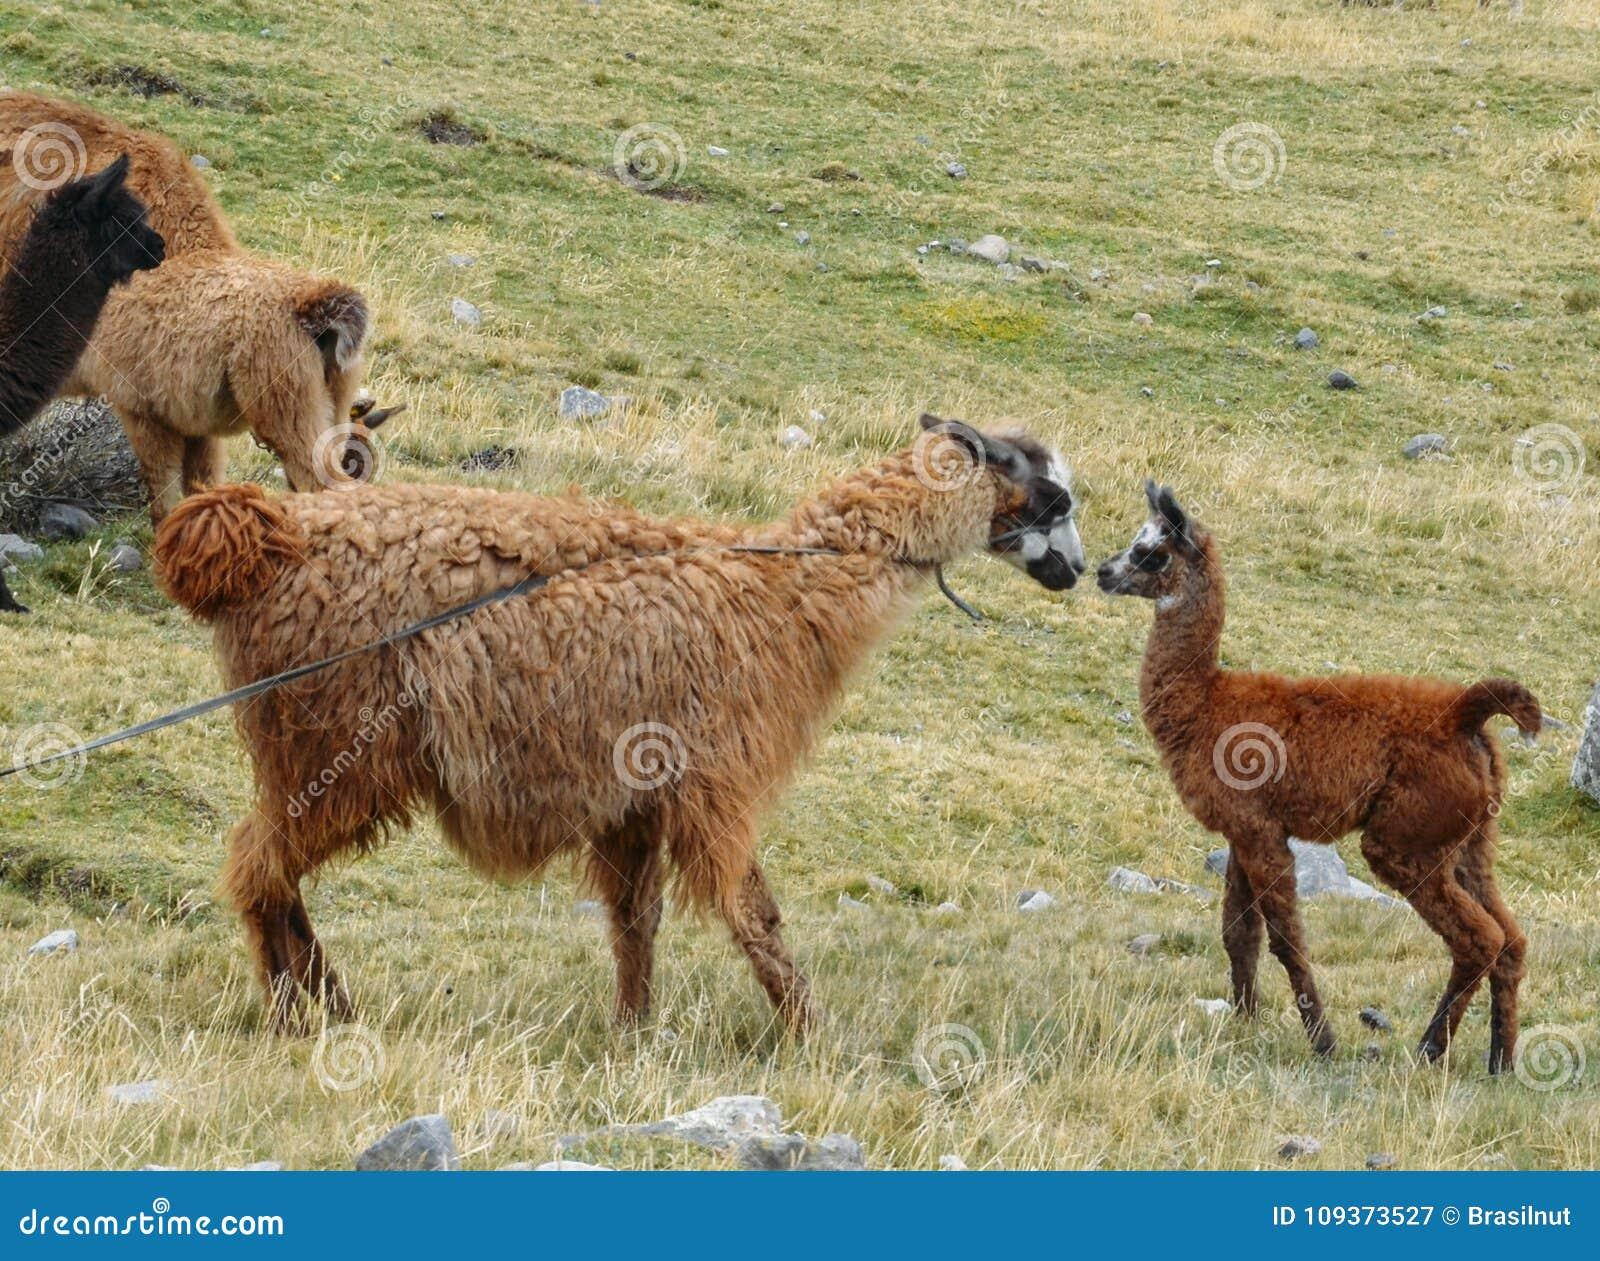 Llama είναι ένας εξημερωμένος νότος - αμερικανικό camelid, που χρησιμοποιείται ευρέως ως ζώο κρέατος και πακέτων από τους των Άνδ